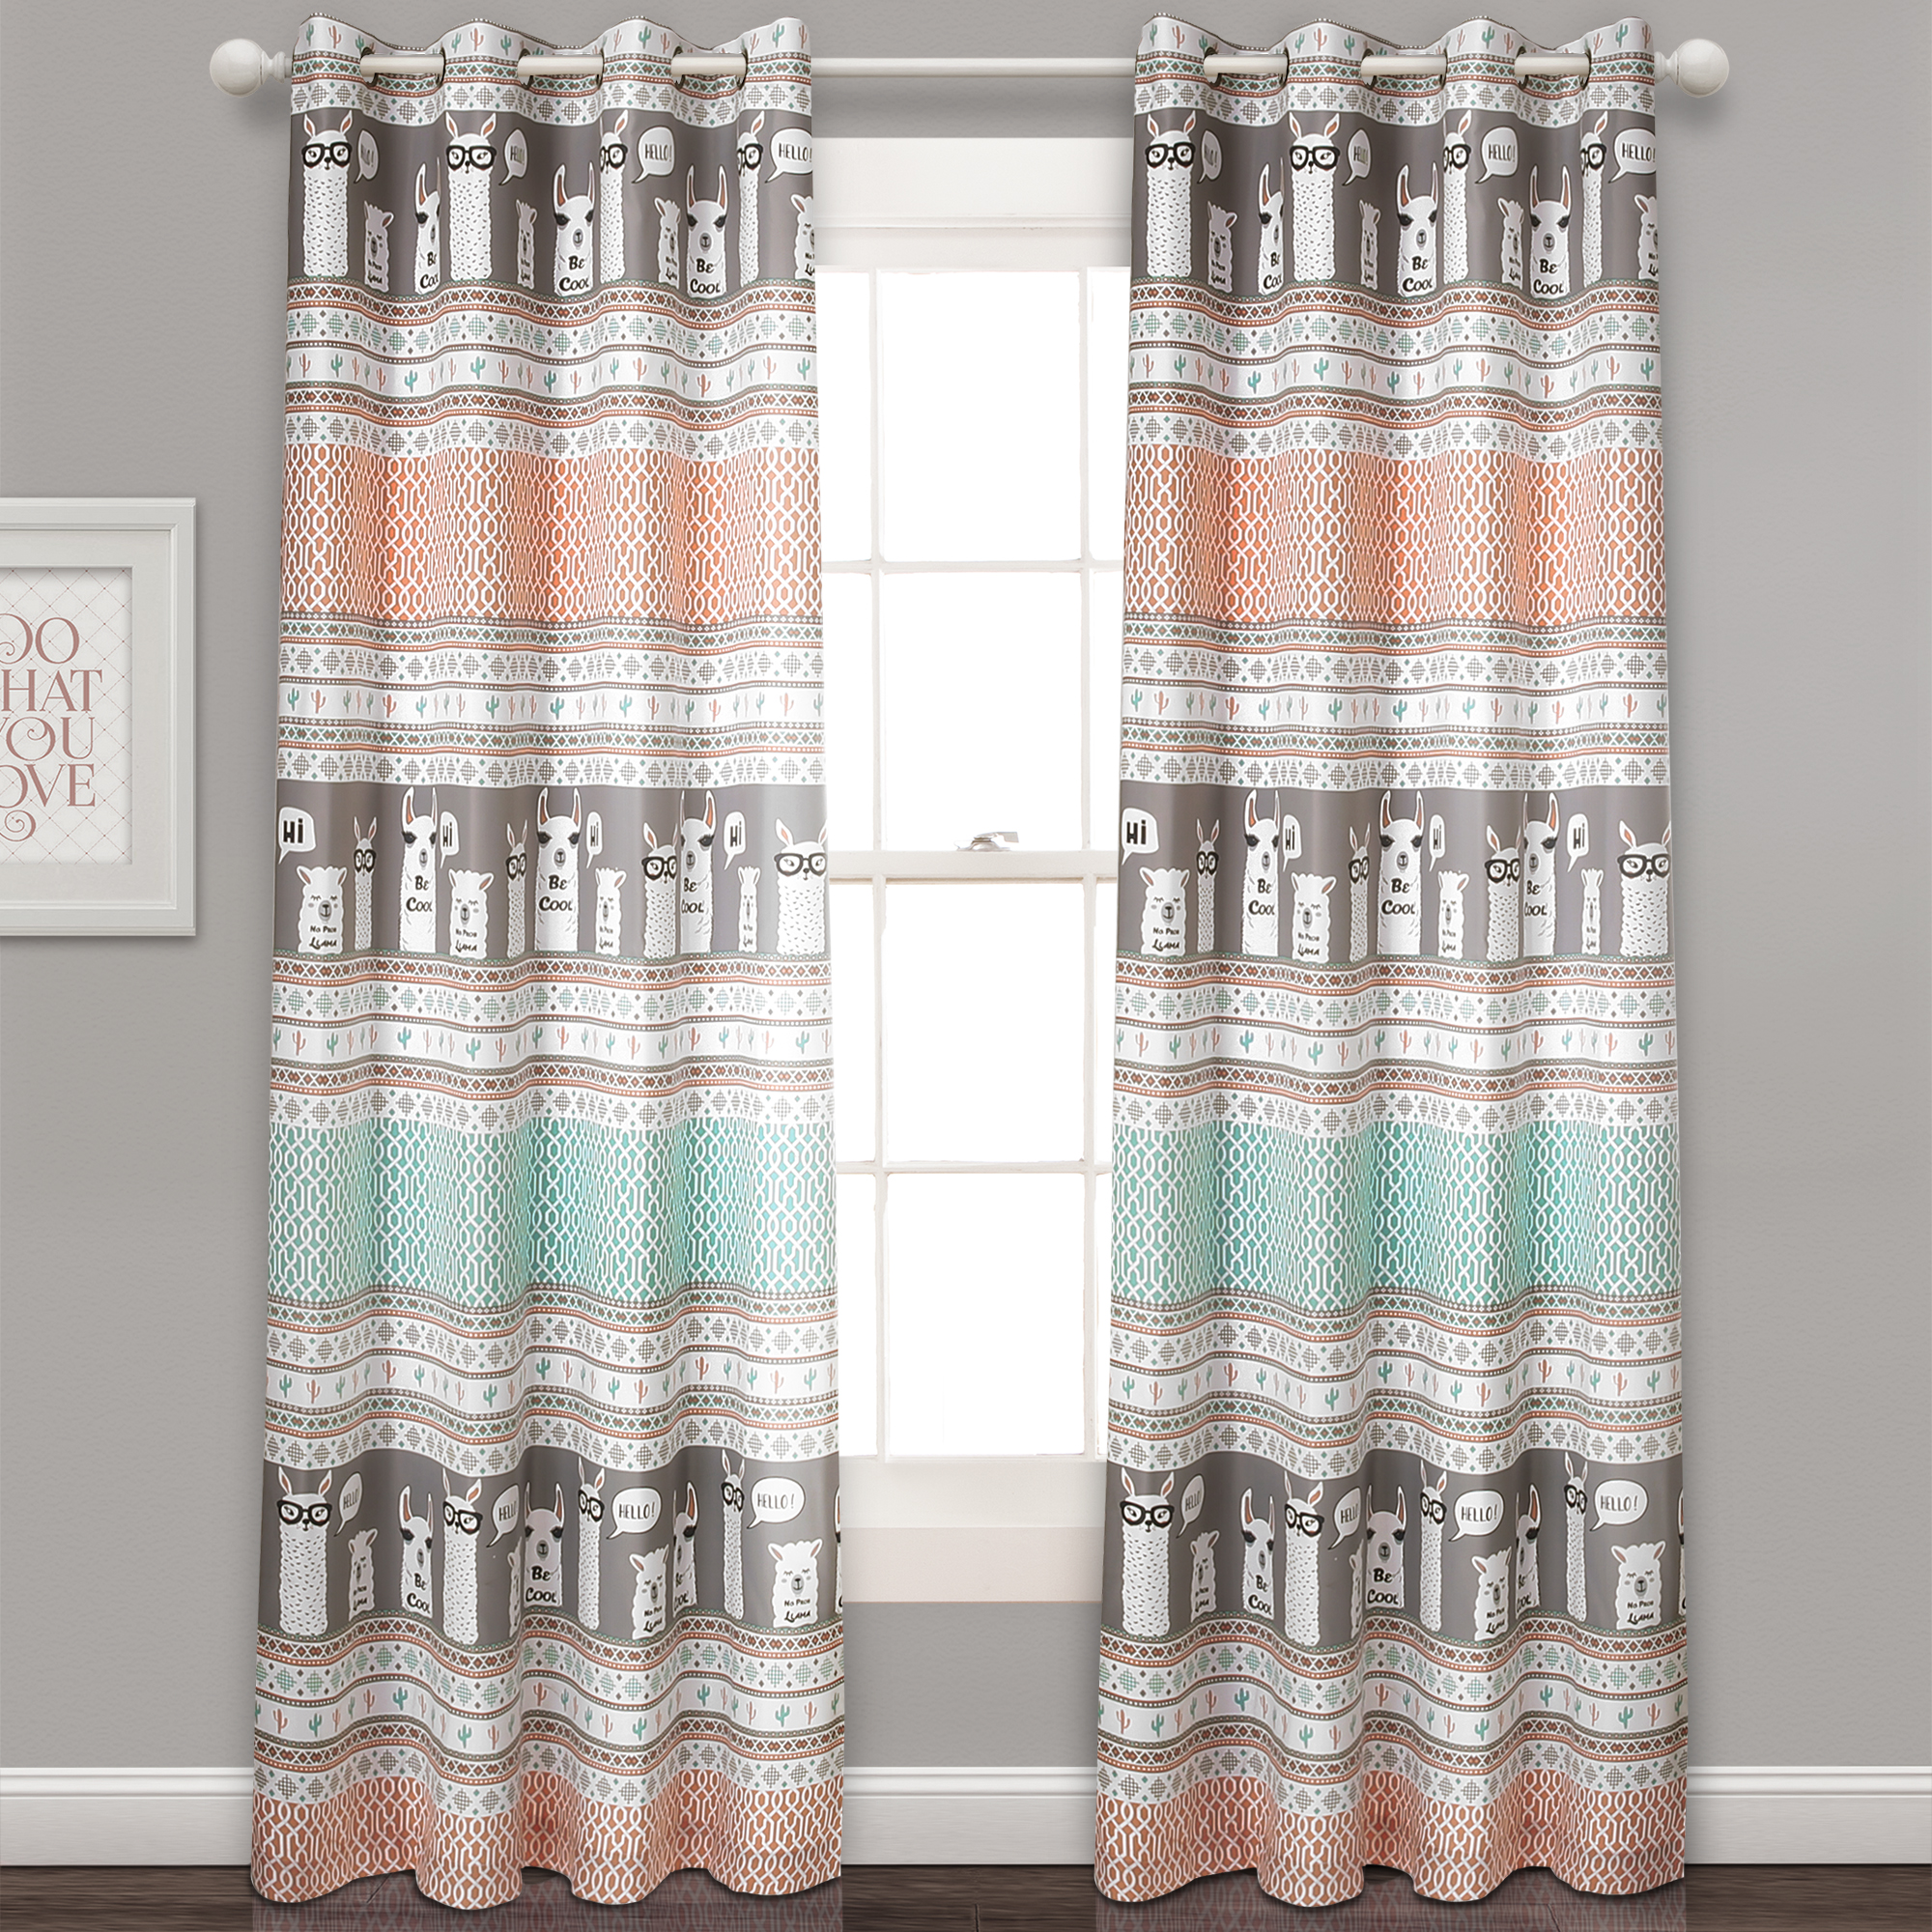 Llama Stripe Room Darkening Window Curtain Panels Set